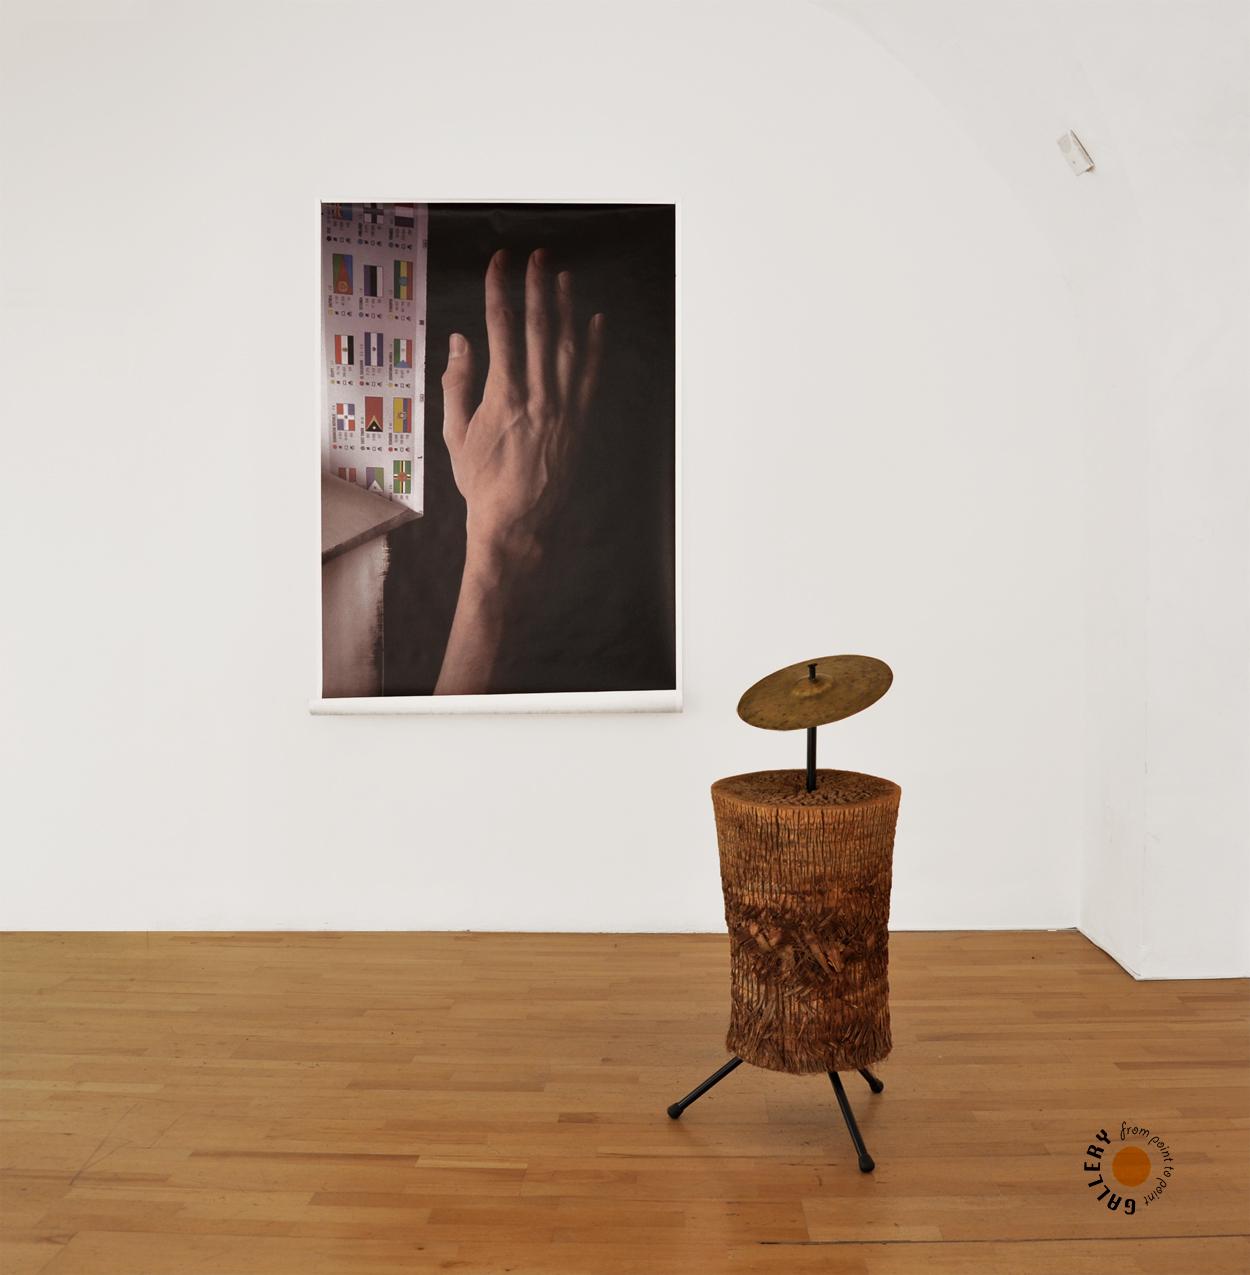 Resonance's Exposition